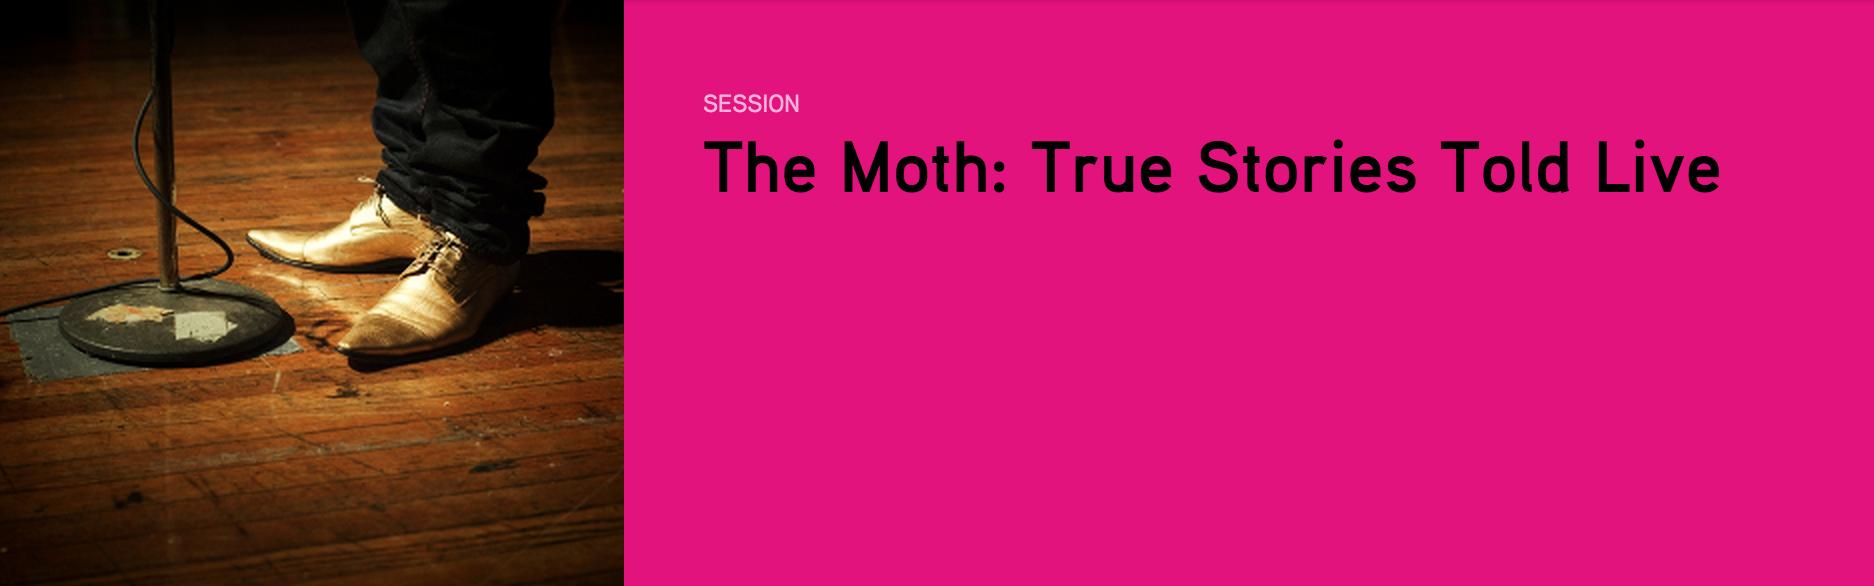 The Moth MWF